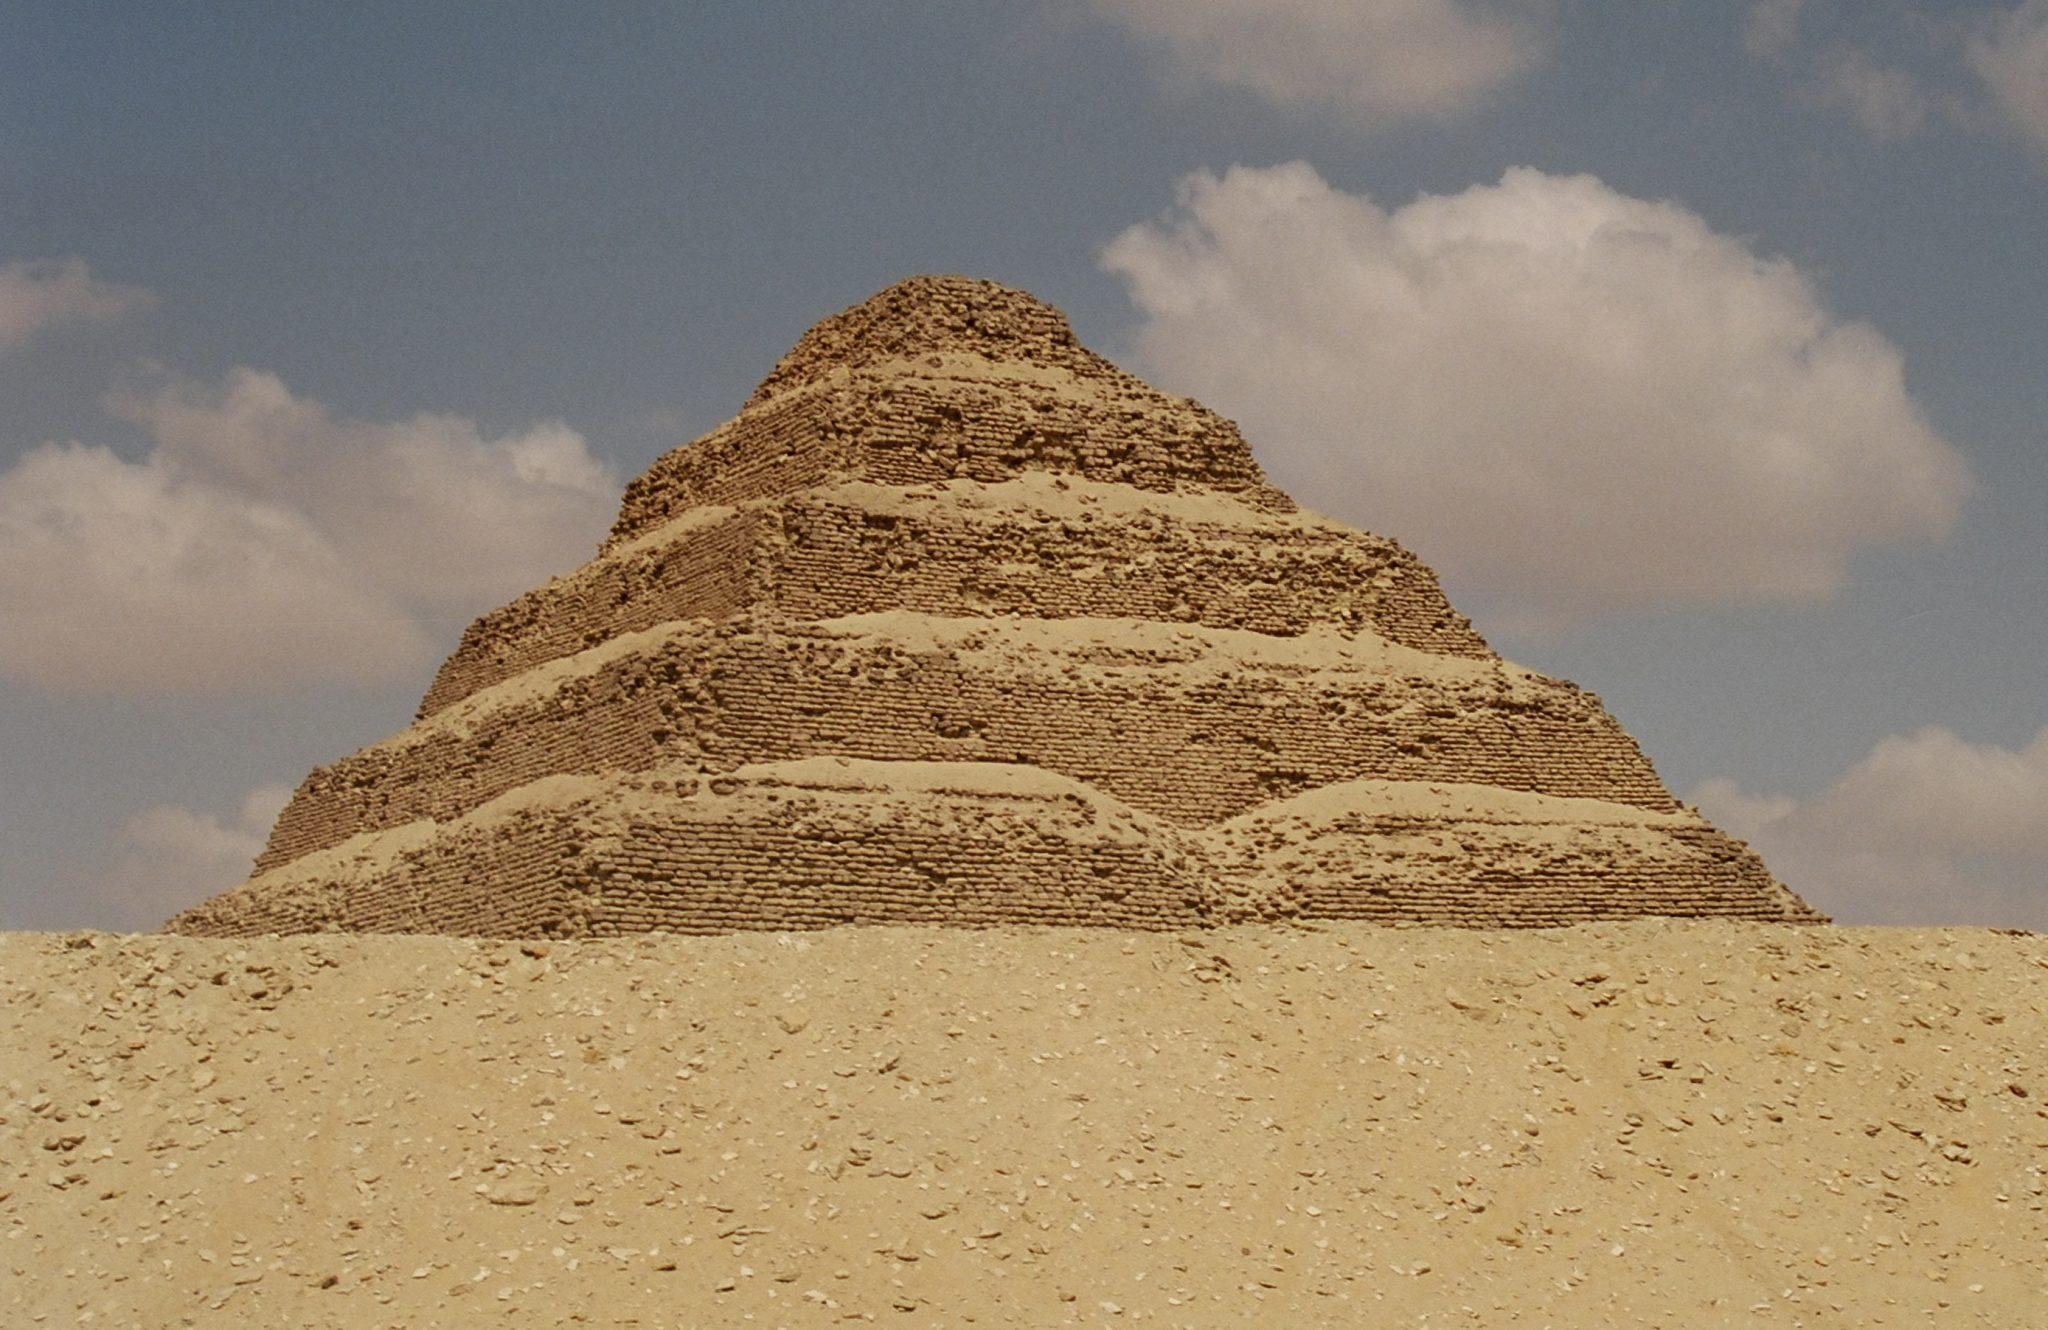 The pyramid of Saqqara, Egypt